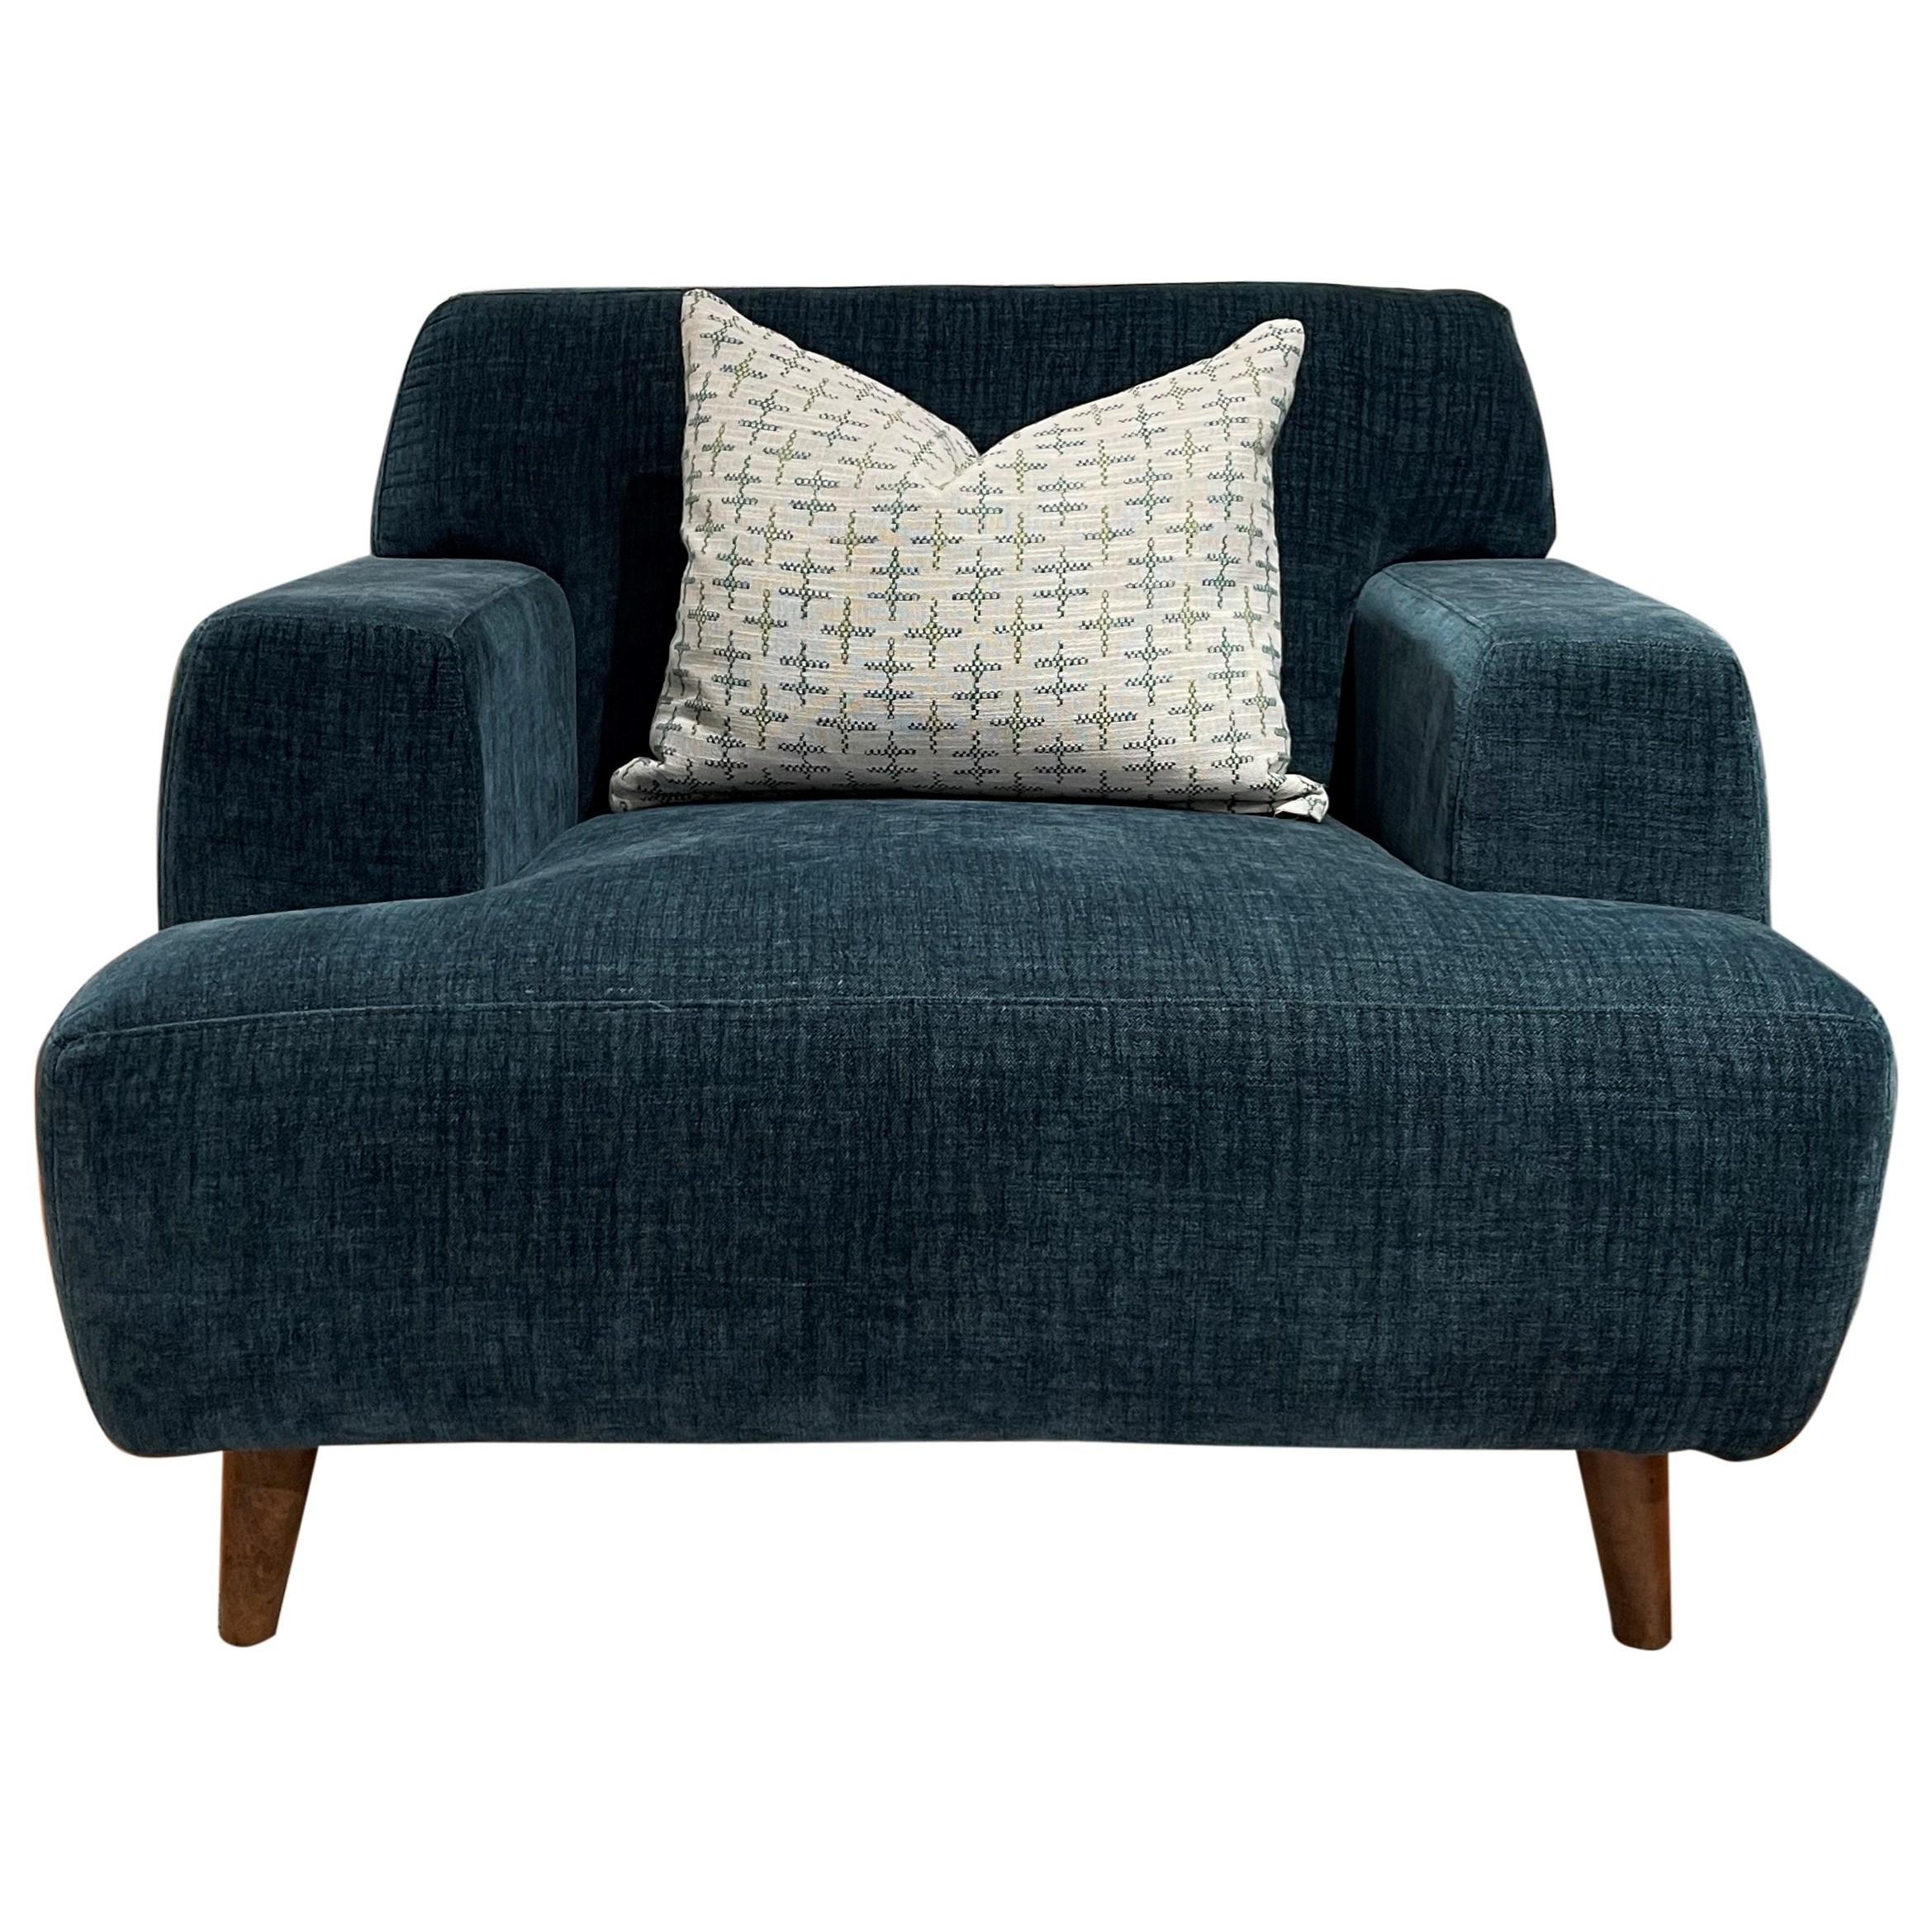 Banks Arm Chair by Jonathan Louis at HomeWorld Furniture